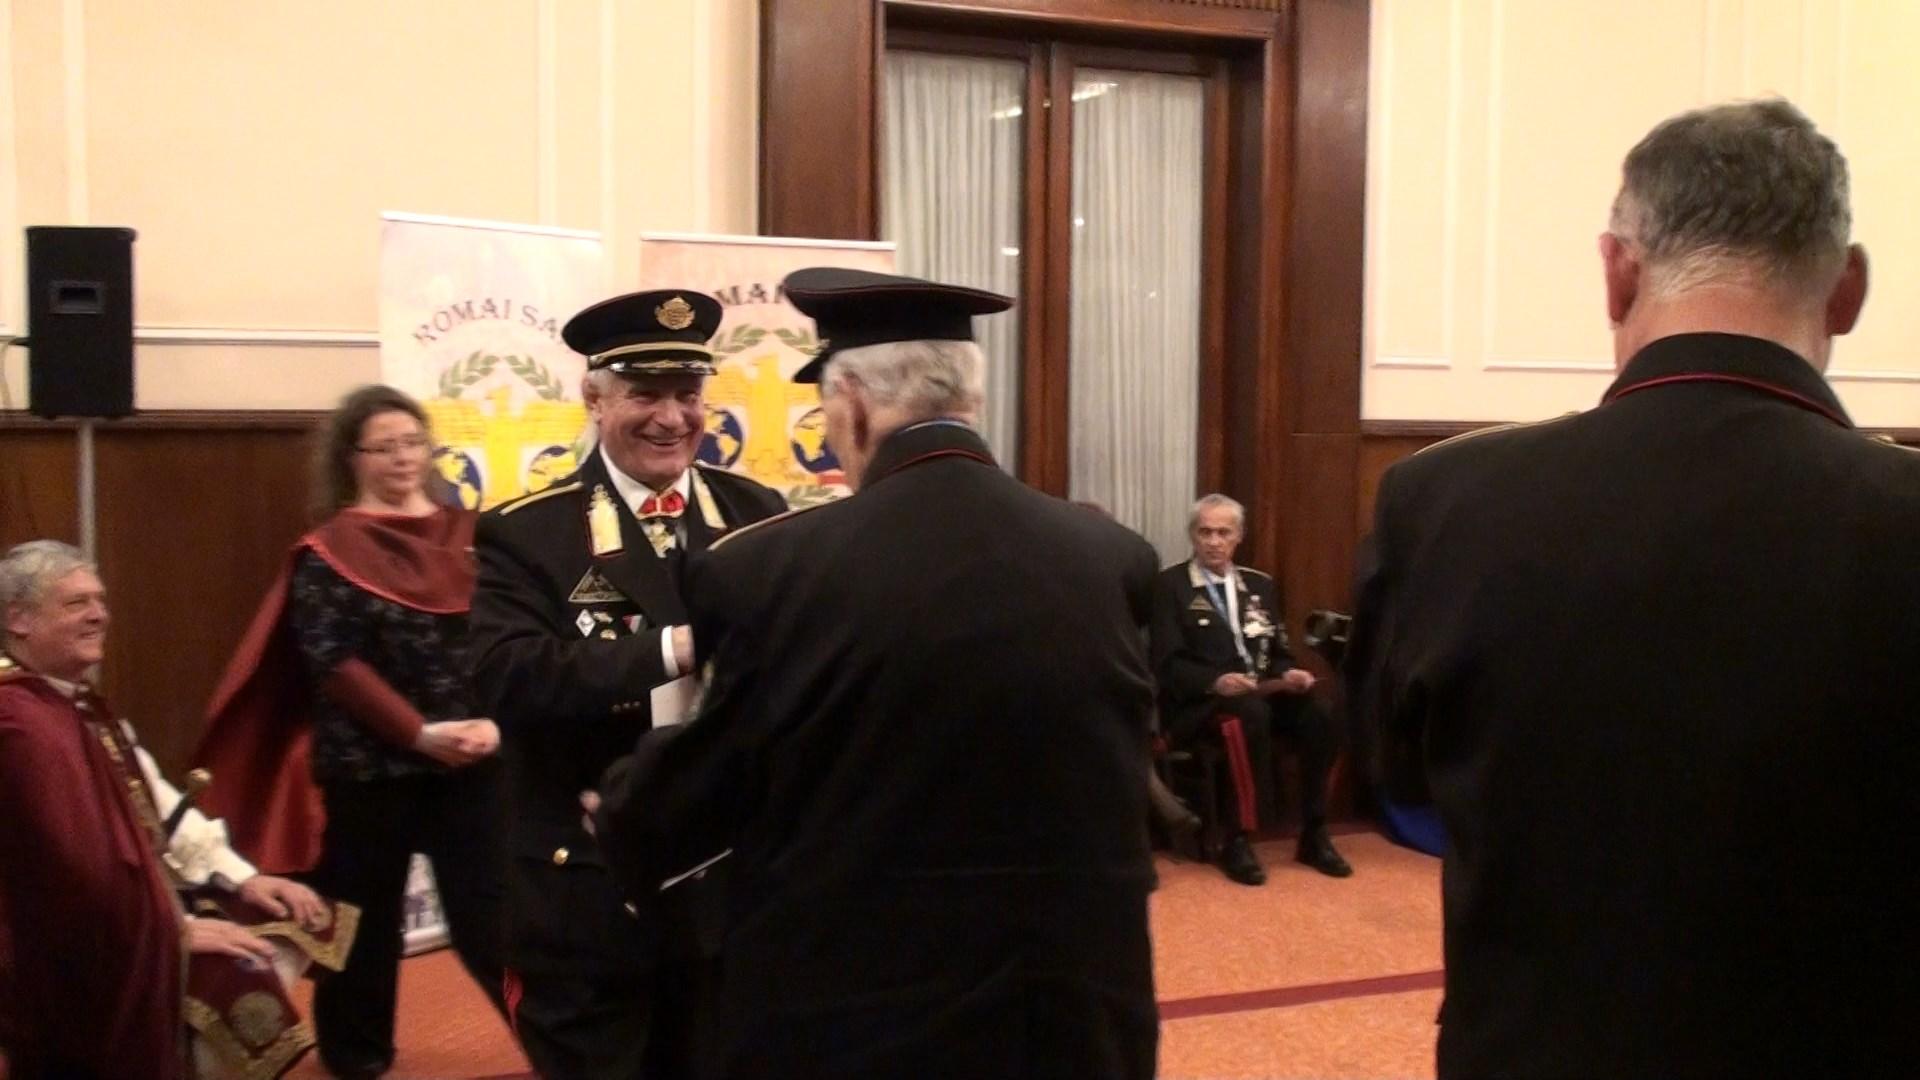 2 prof. dr. Vladislav Kirilovszky KGC nör. ddtbk praefectus legionis